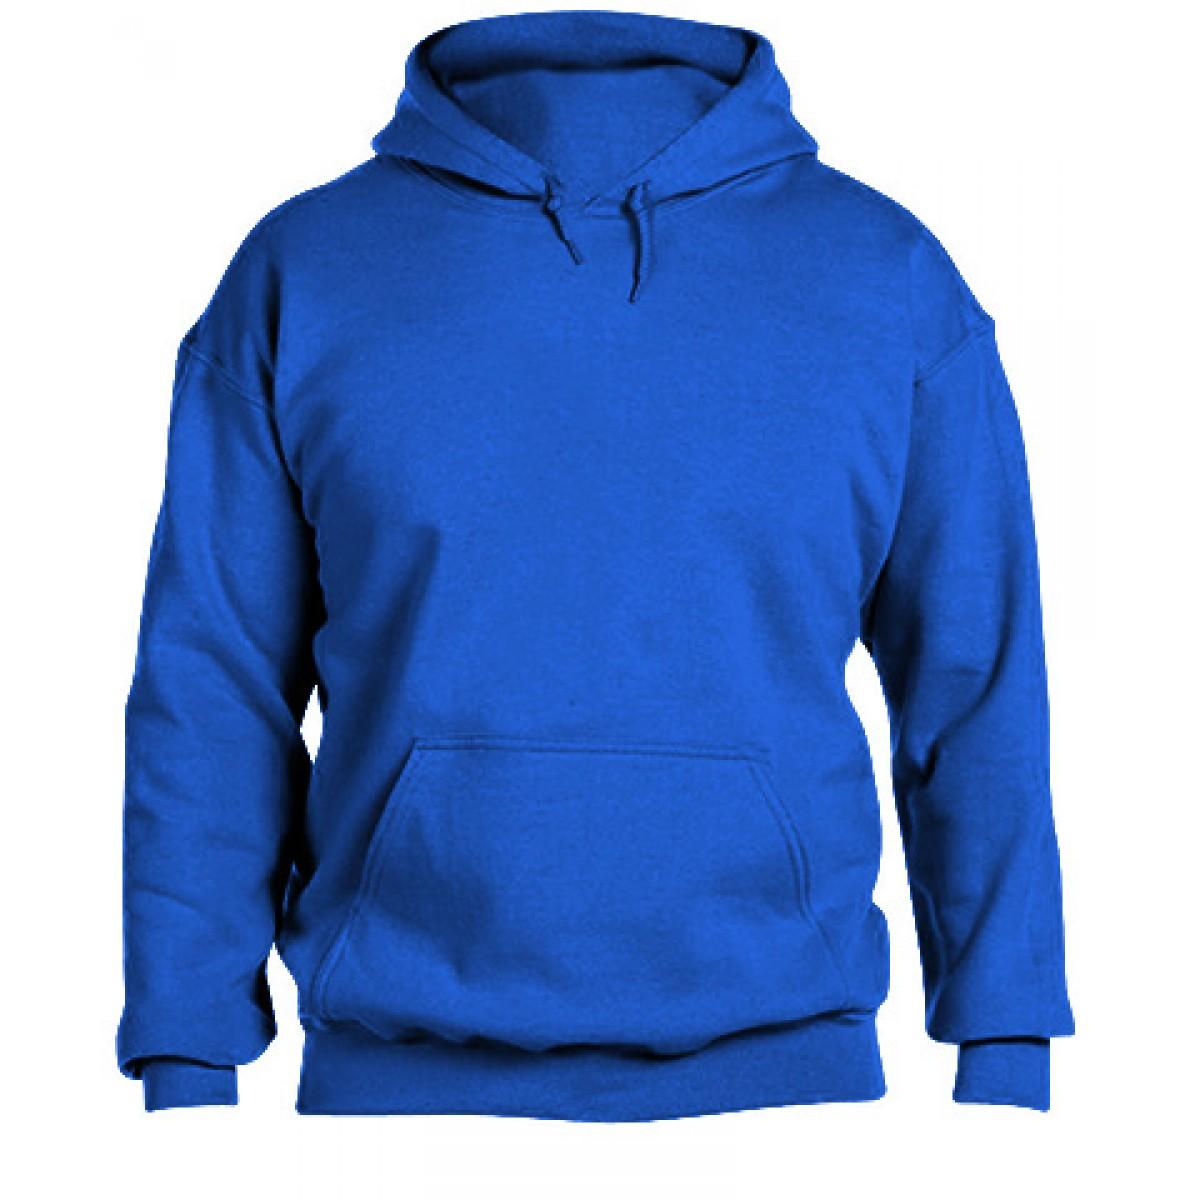 Hooded Sweatshirt  50/50 Heavy Blend-Royal Blue-L